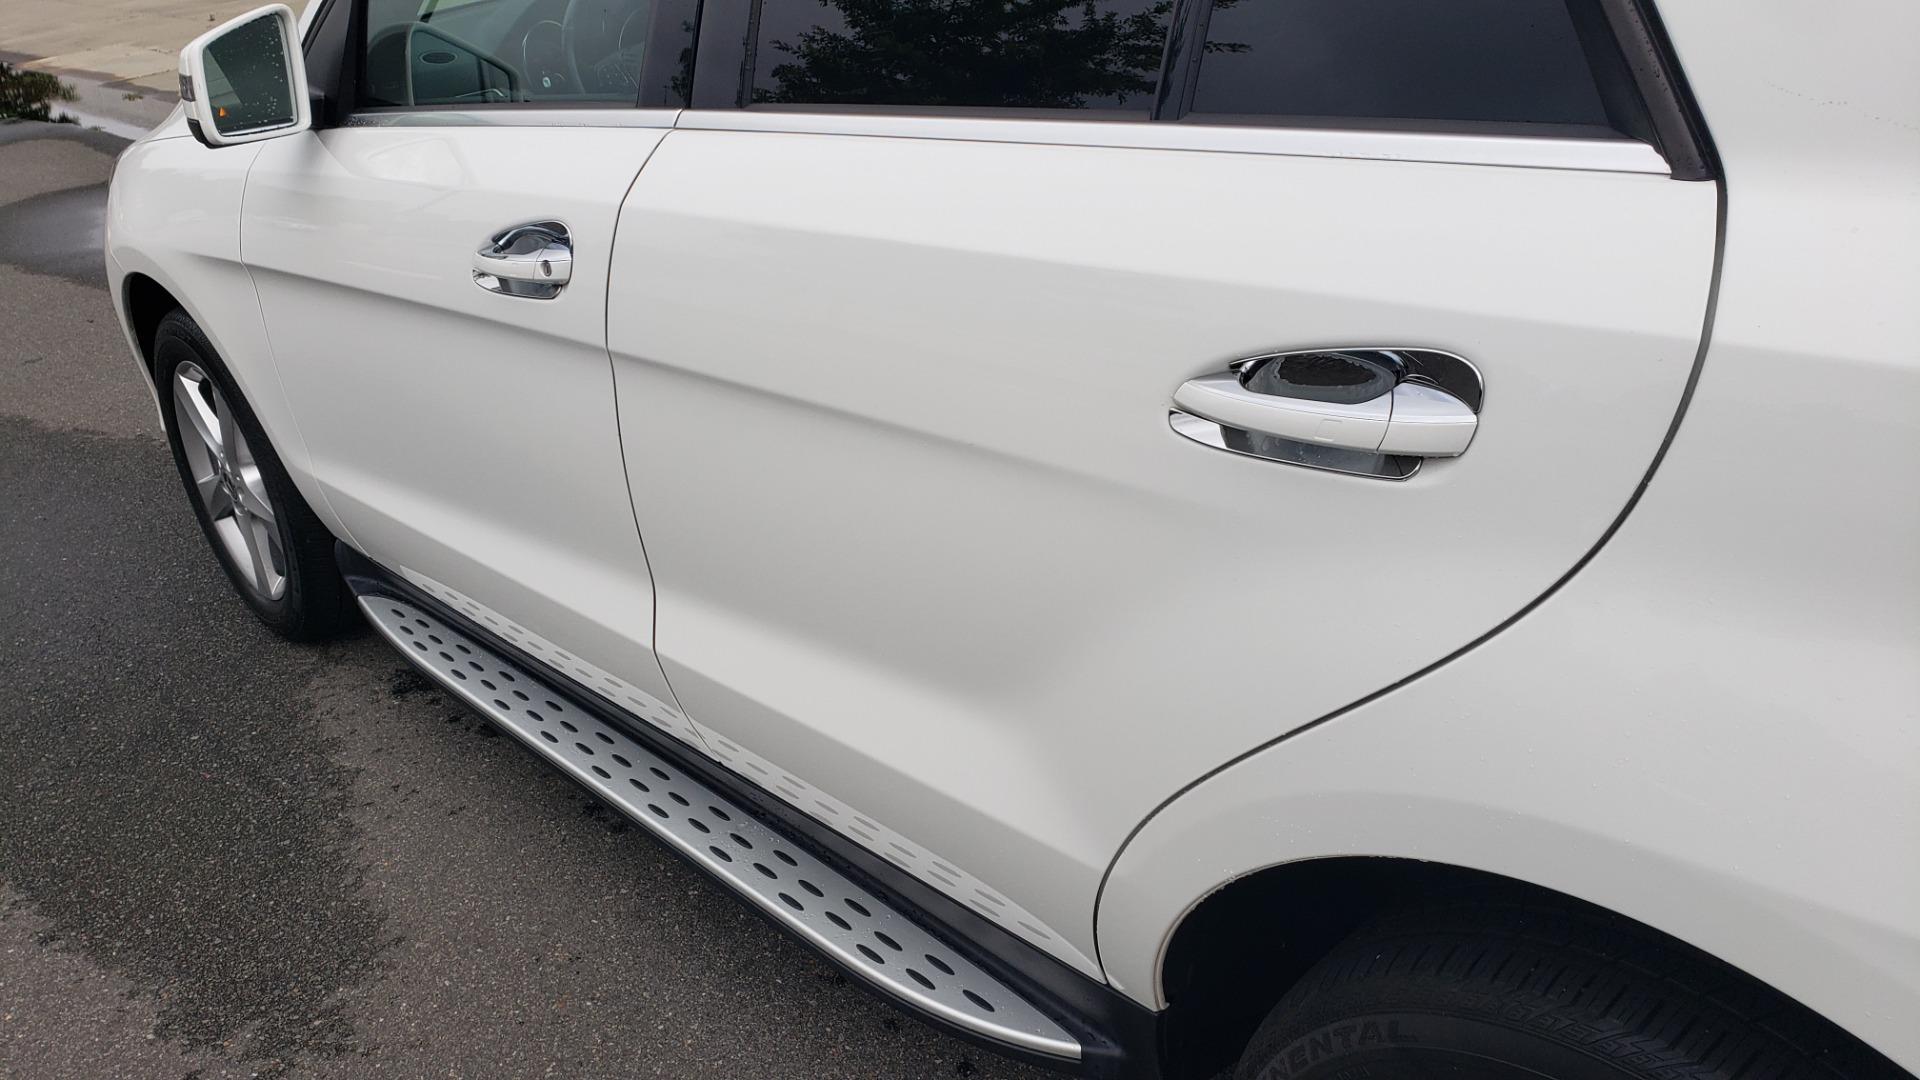 Used 2018 Mercedes-Benz GLE 350 4MATIC / PREM PKG / NAV / PARK ASST / K/H SND / HITCH / REARVIEW for sale $40,801 at Formula Imports in Charlotte NC 28227 10